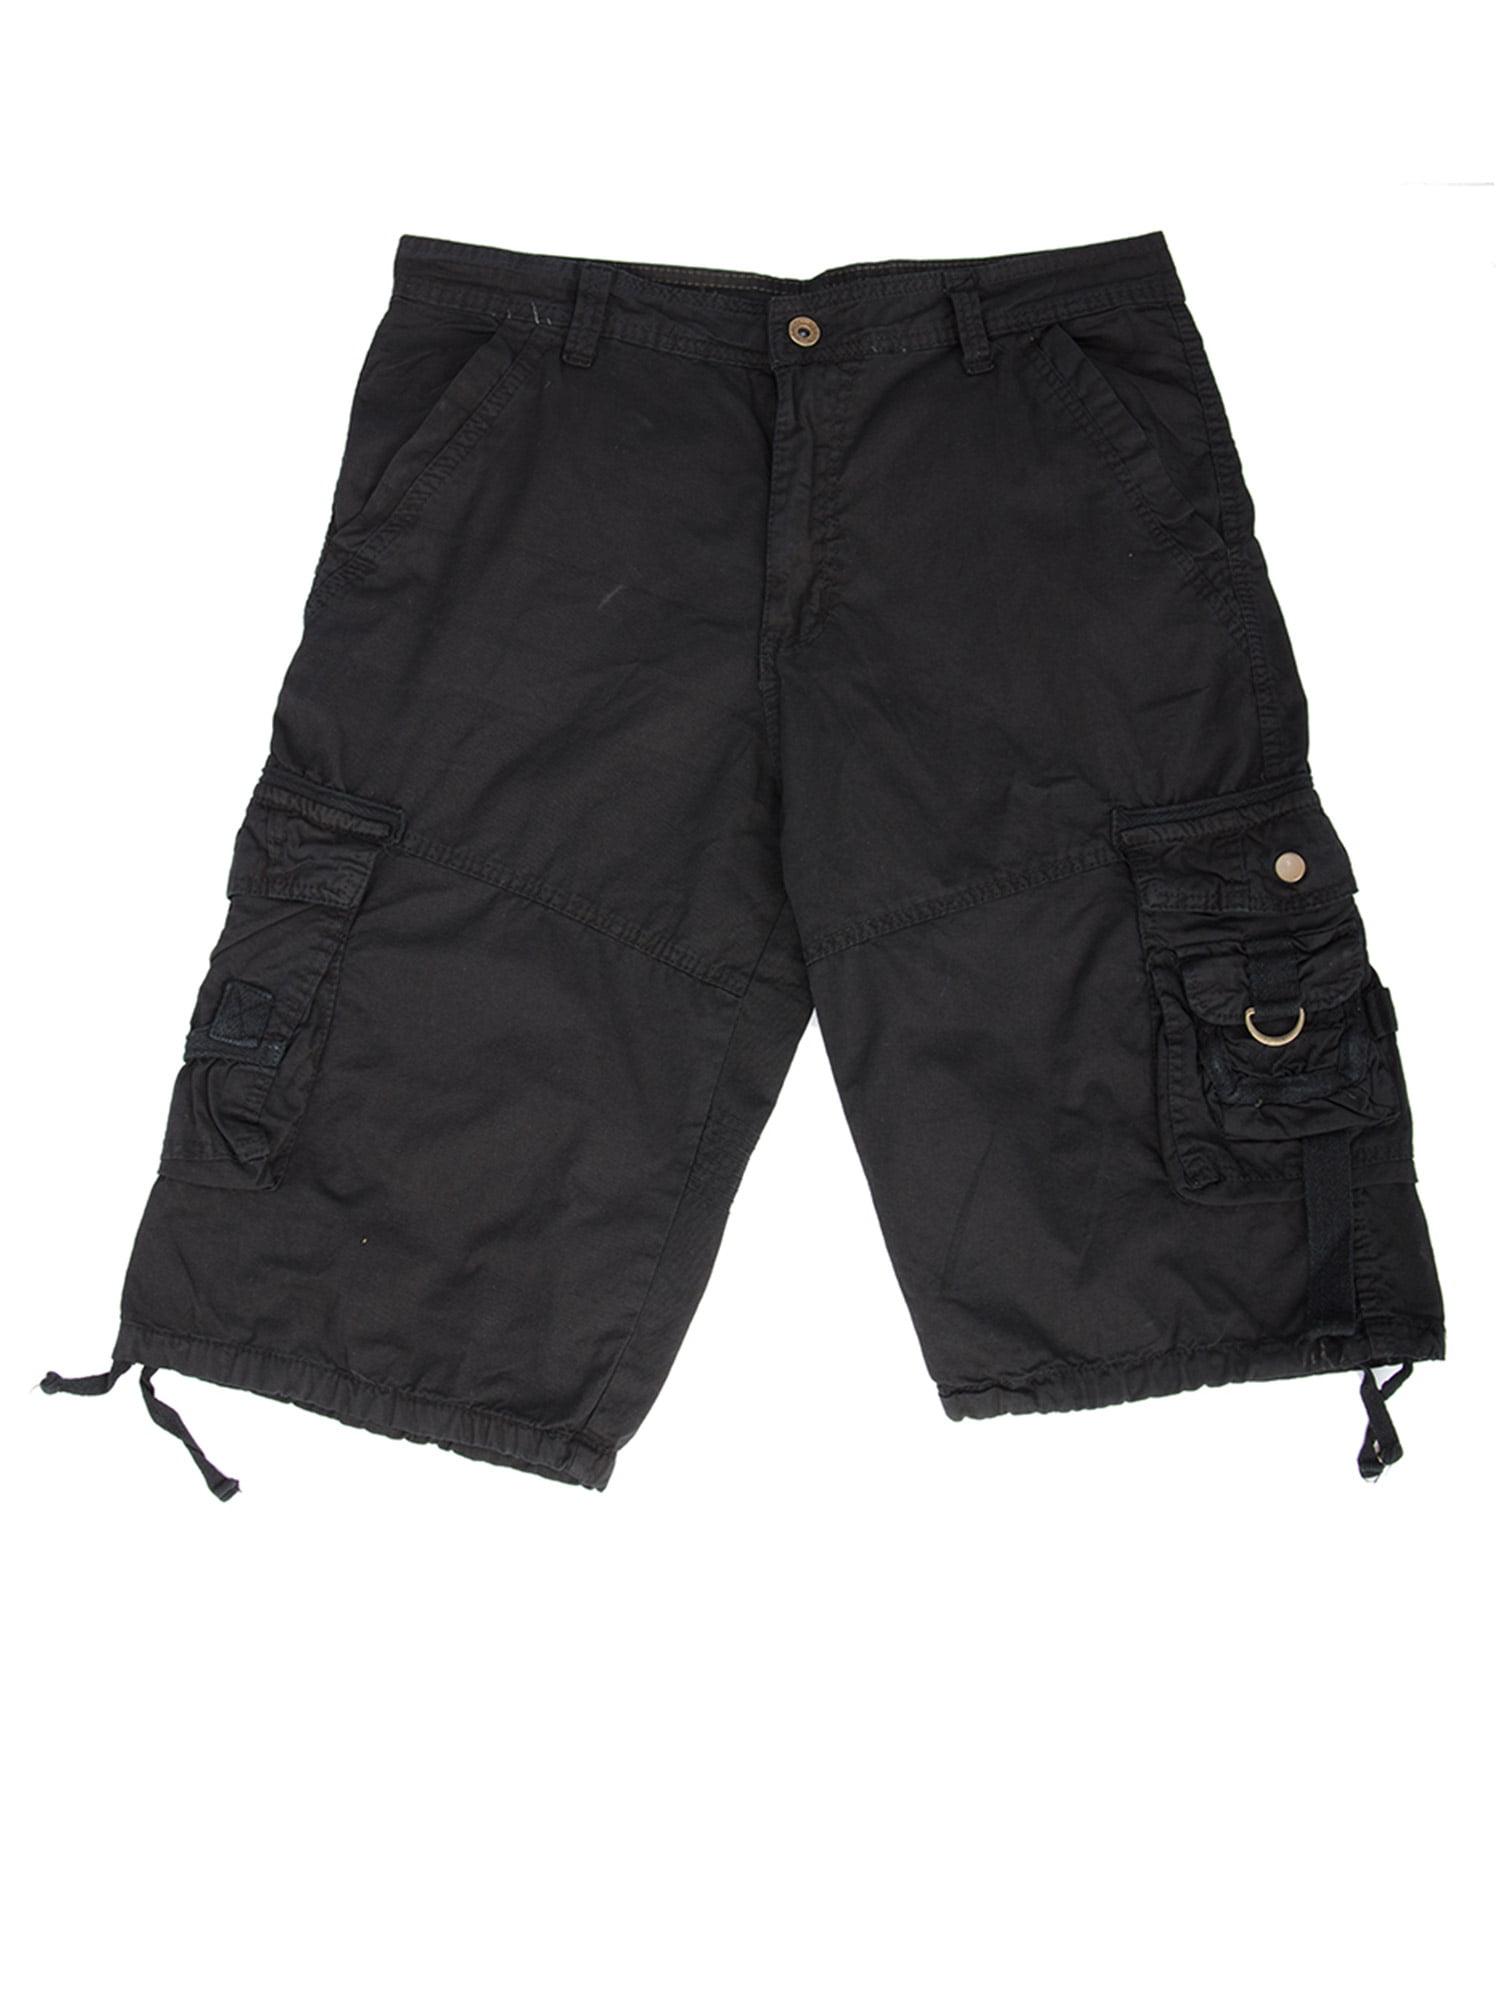 SAYFUT Men's Vintage Paratrooper Style Cotton Cargo Short  Pockets Baggy Cargo Pant Black/Gray/Khaki